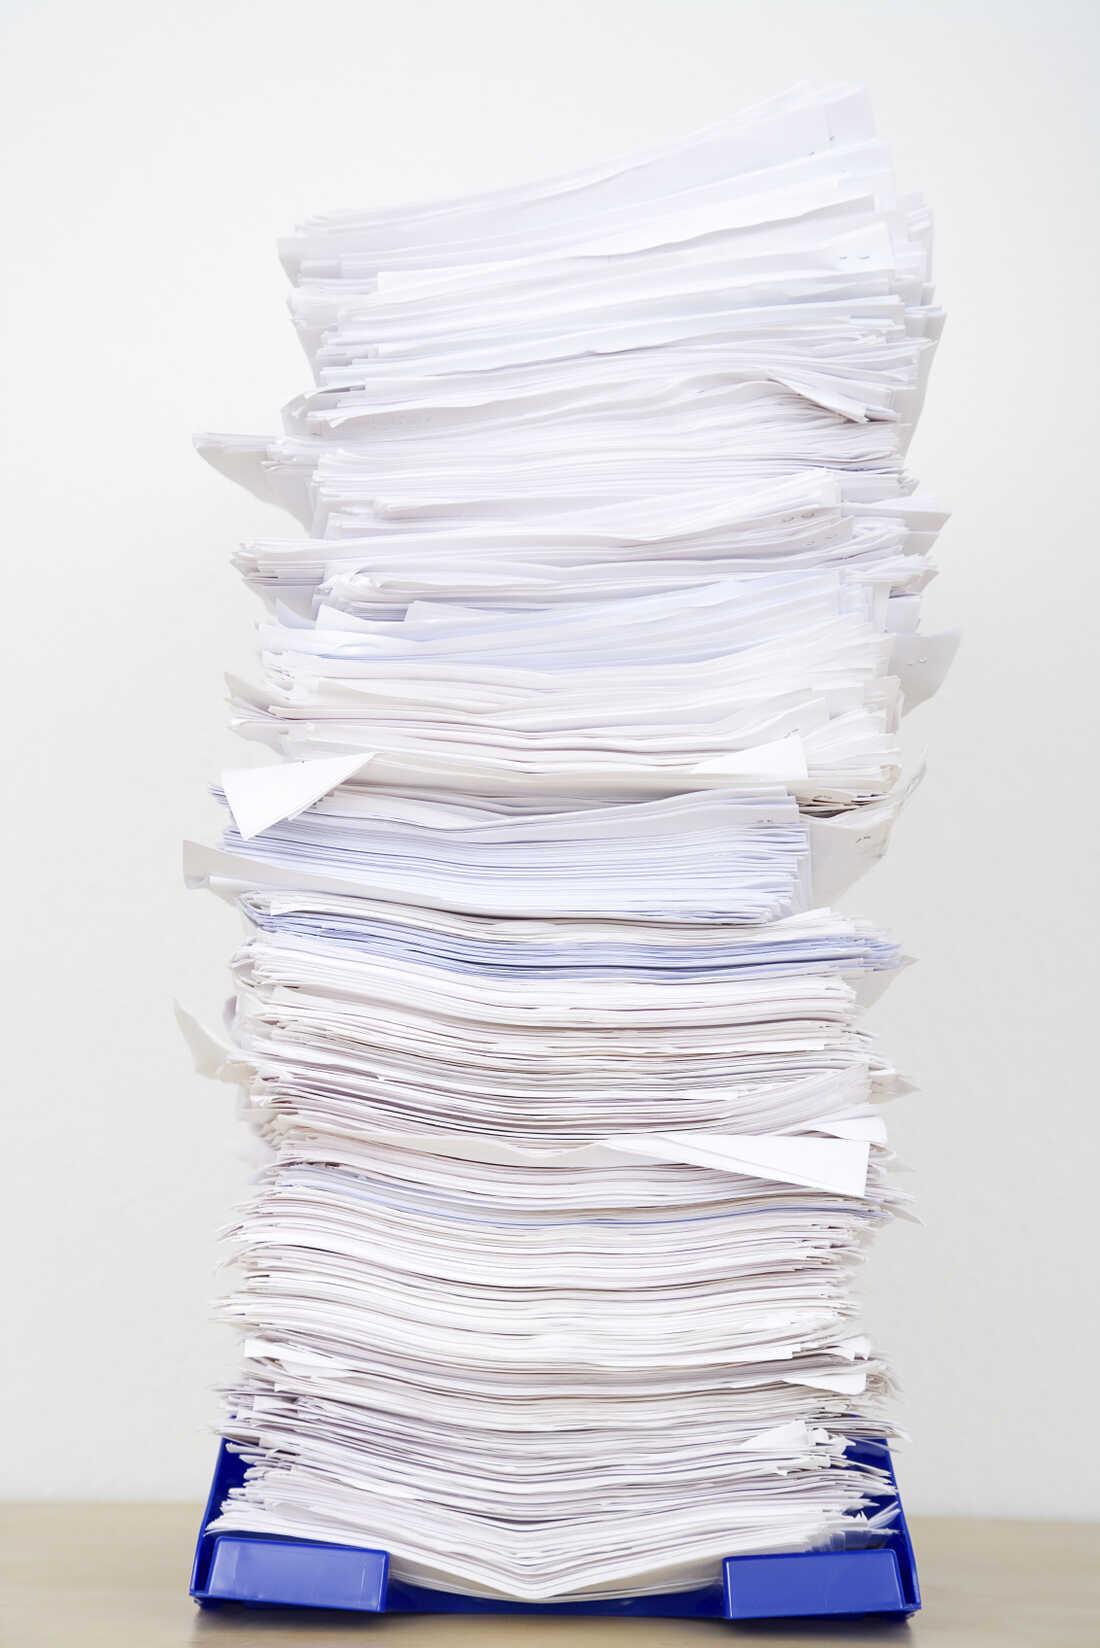 Paperwork.